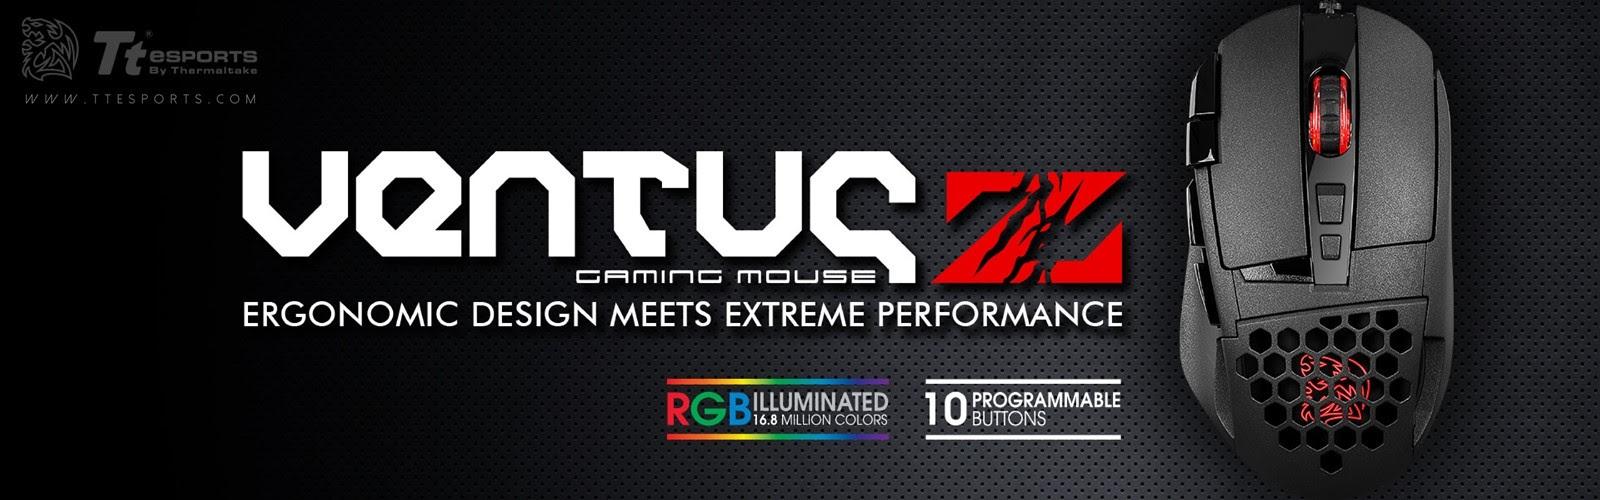 ventus-z-gaming-mouse-techniblogic